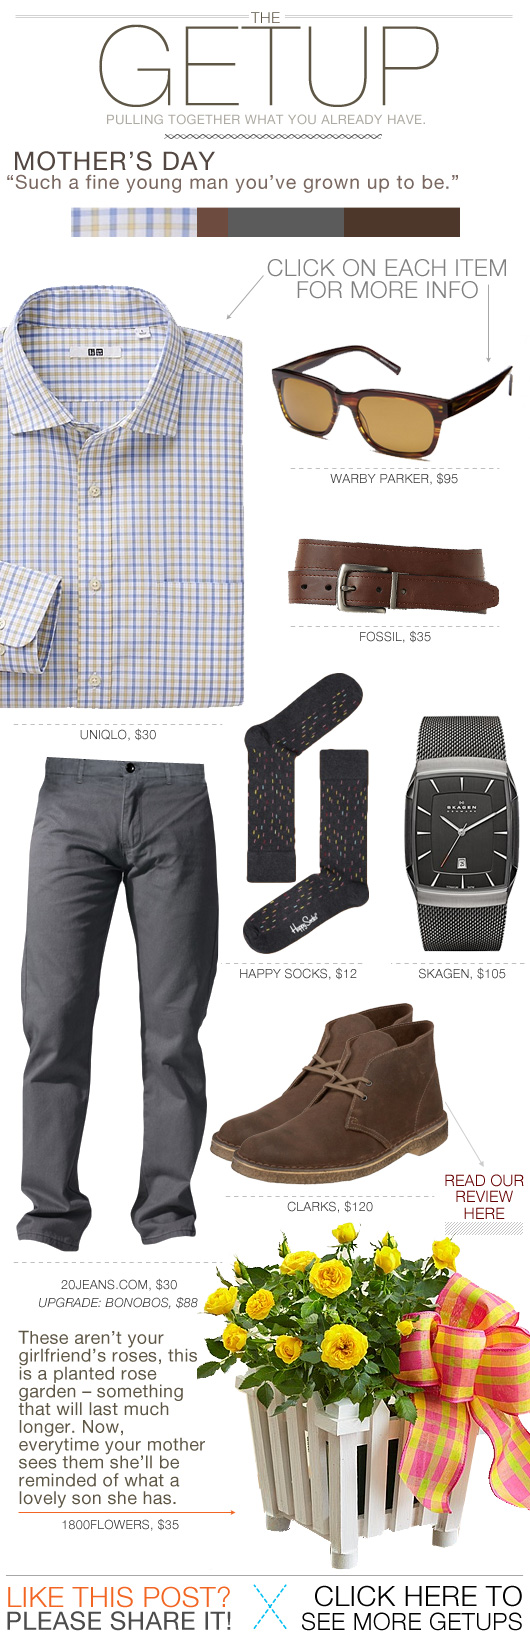 Getup Mothers Day - Check shirt, gray pants, desert boots